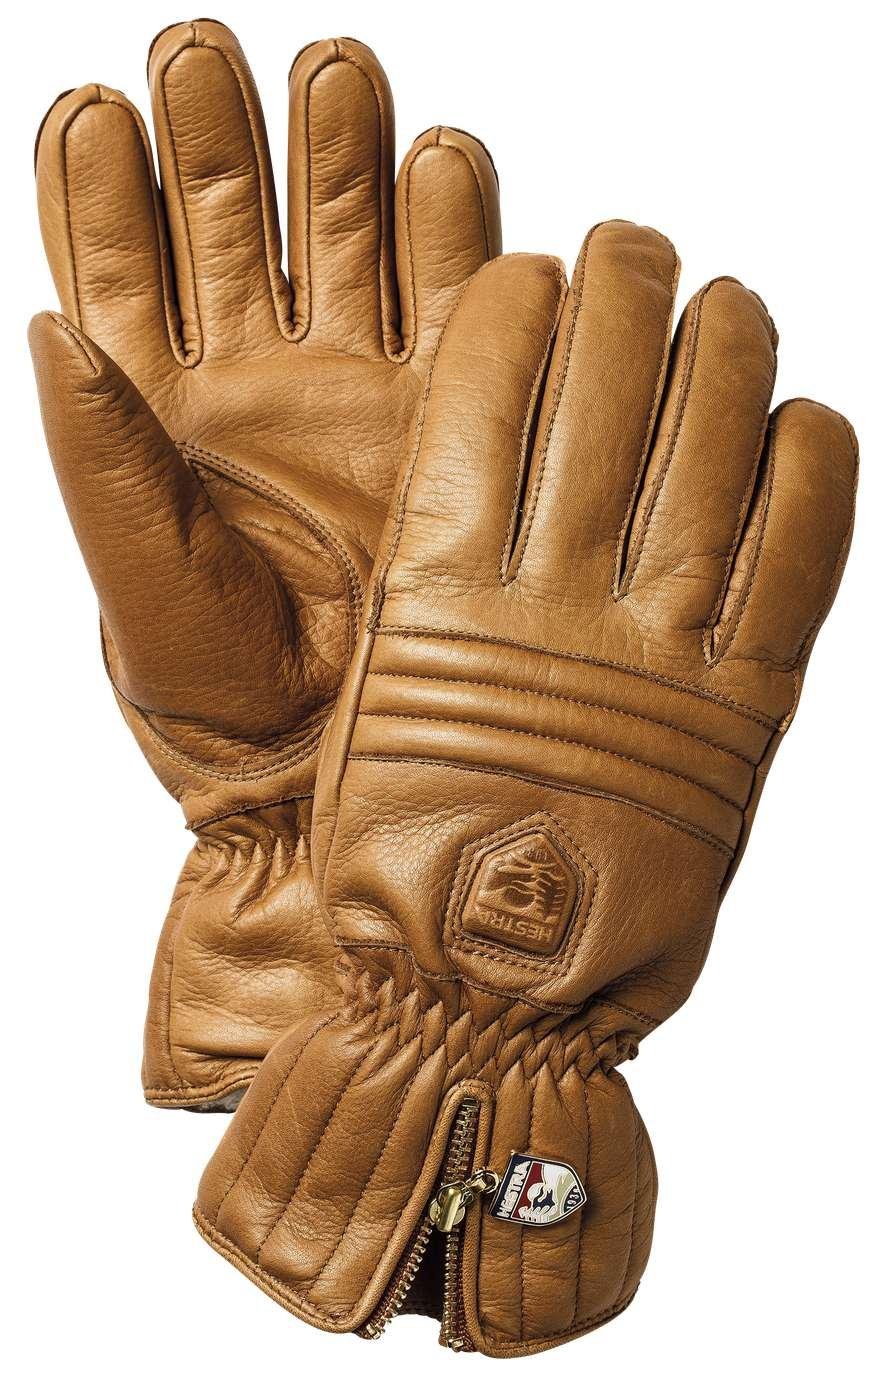 Hestra Unisex Leather Swisswool Classic